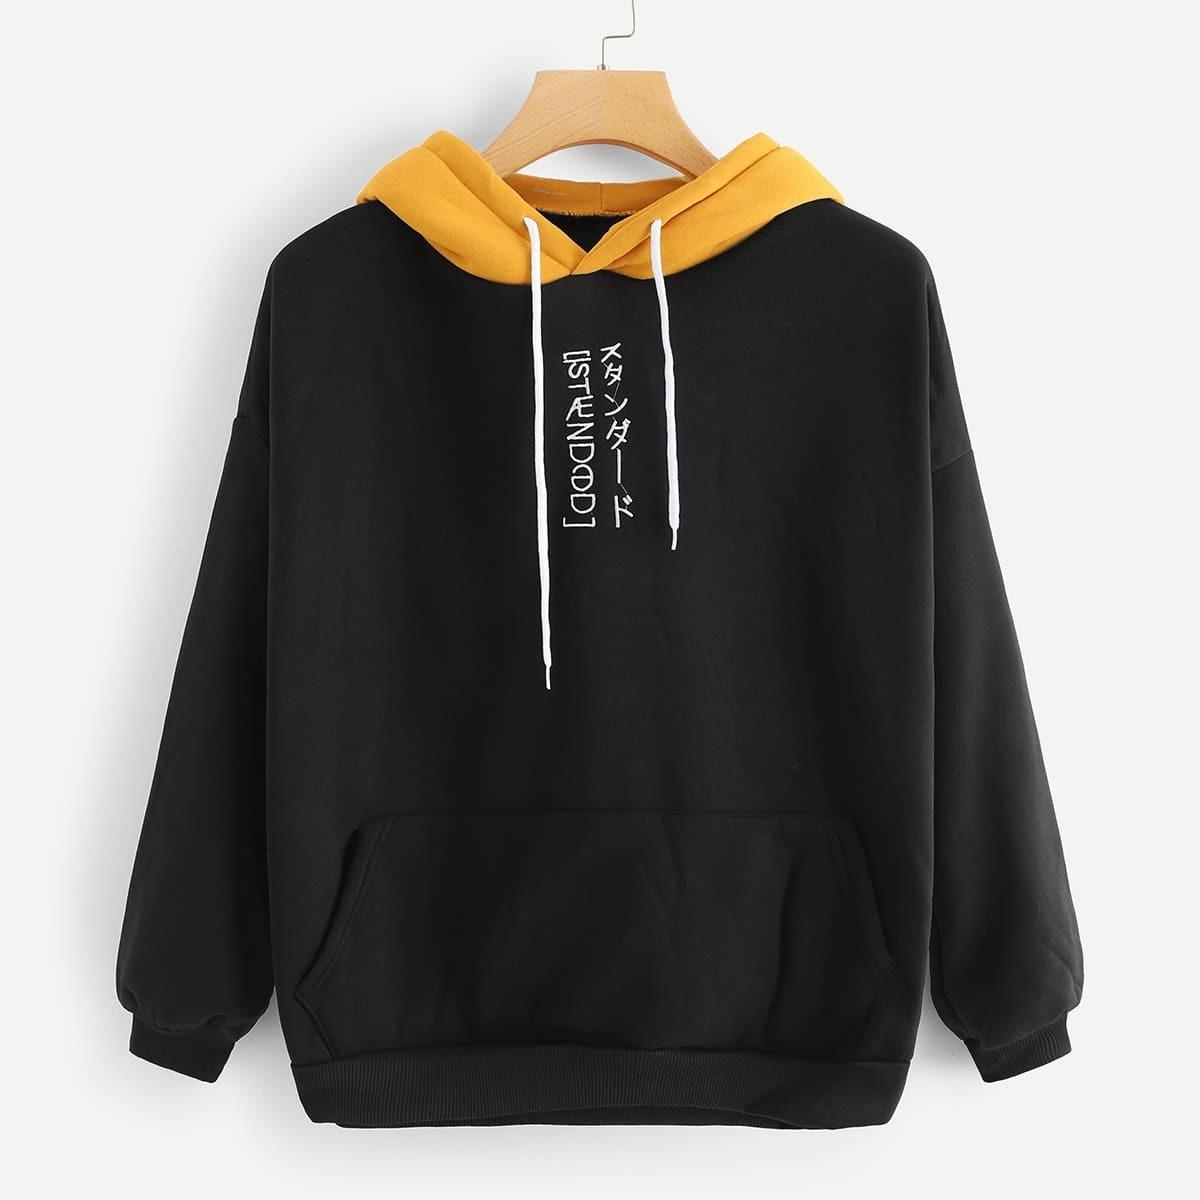 Zwart School  Tekst Sweater Borduurwerk